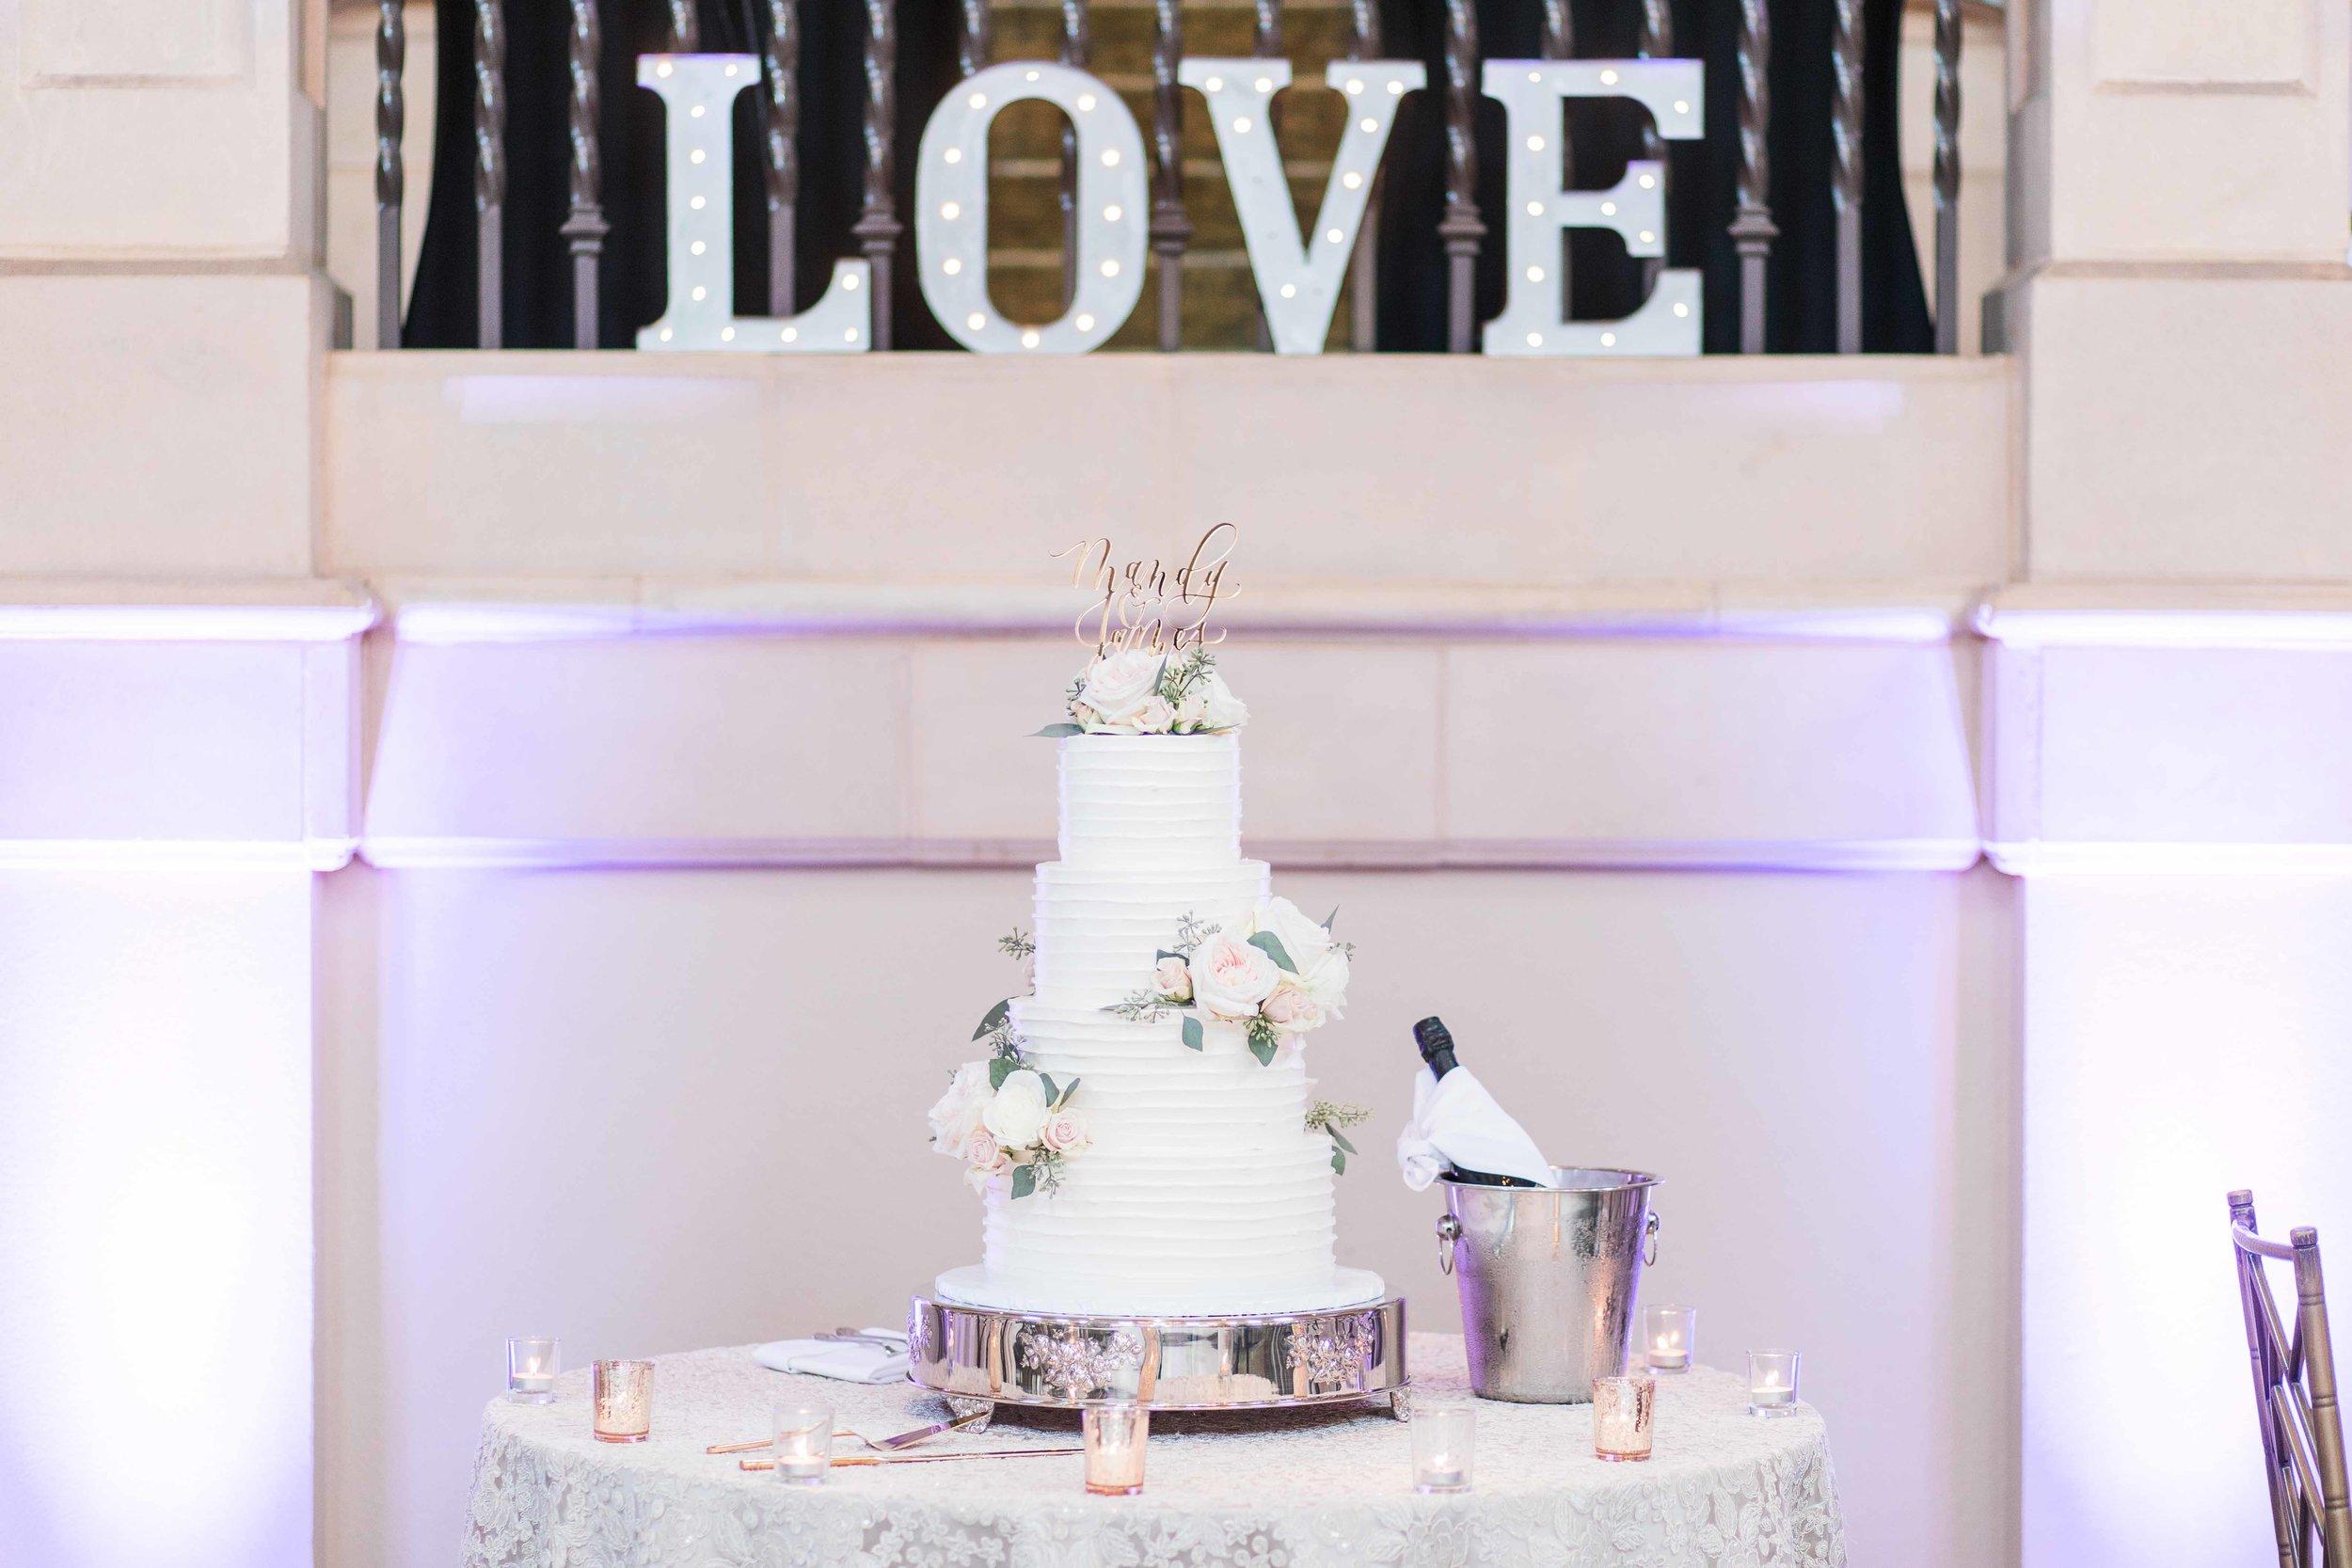 Ruby Hill Wedding Photos by JBJ Pictures - San Francisco Wedding Photographer - Pleasanton Wedding Venue (39).jpg